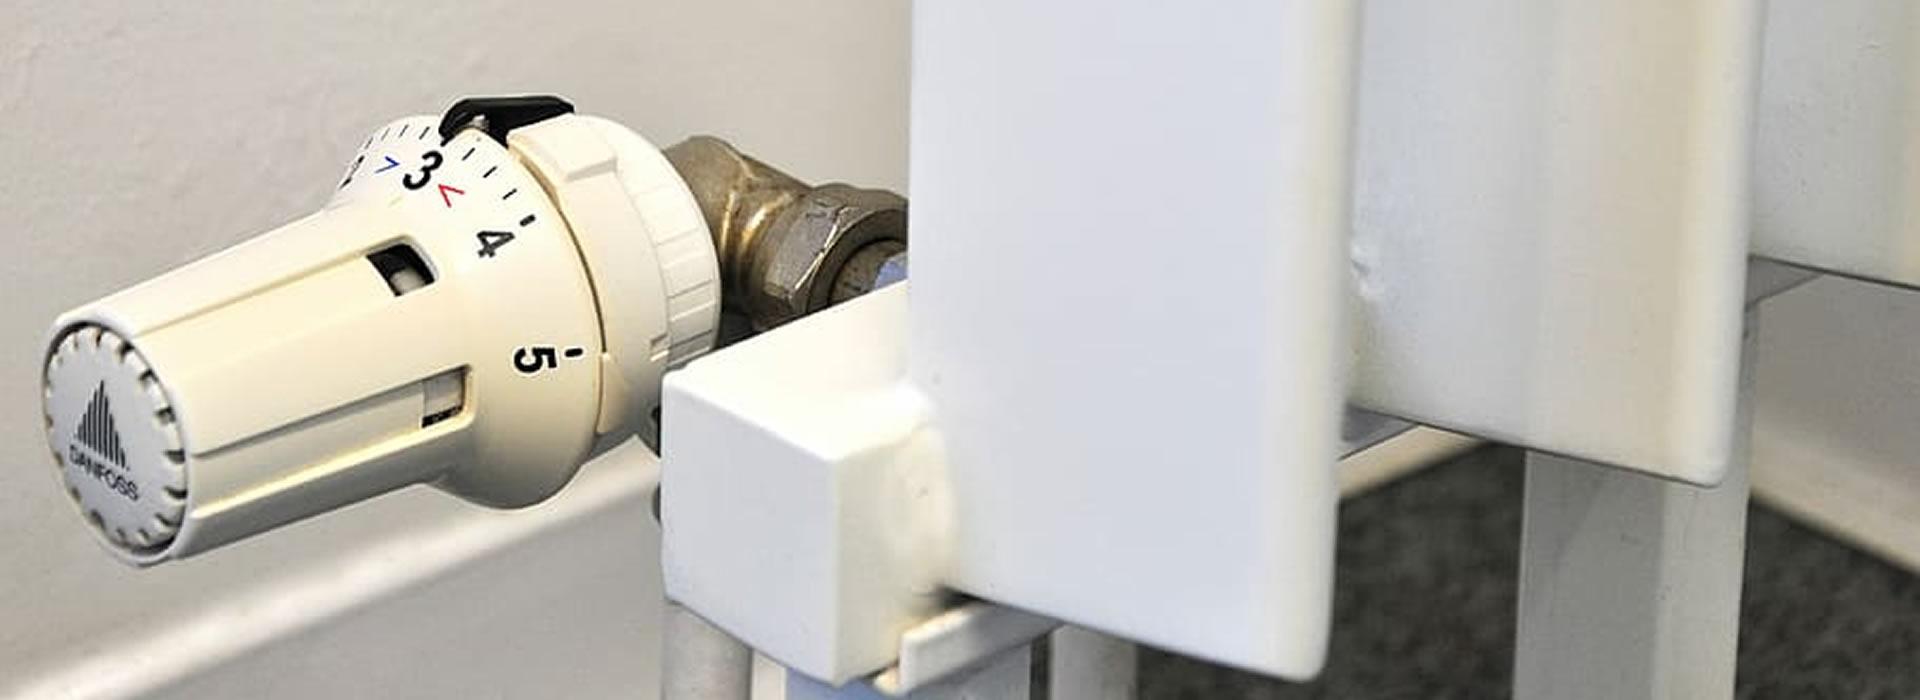 ©Pixabay thermostat-heating-heat-radiator01